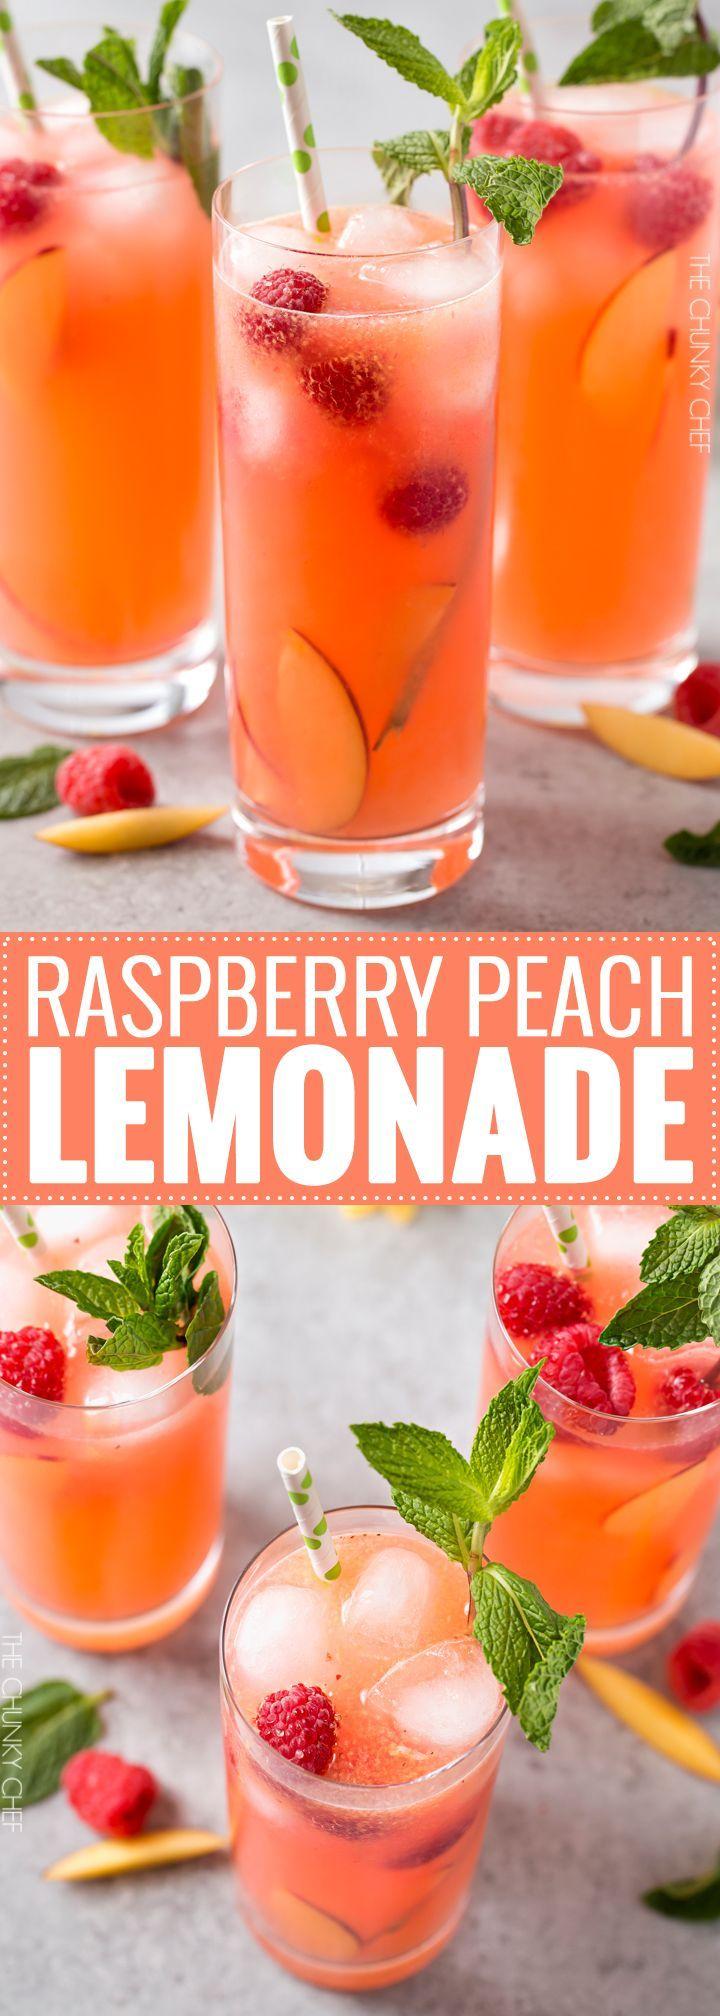 Raspberry Peach Lemonade #lemonade